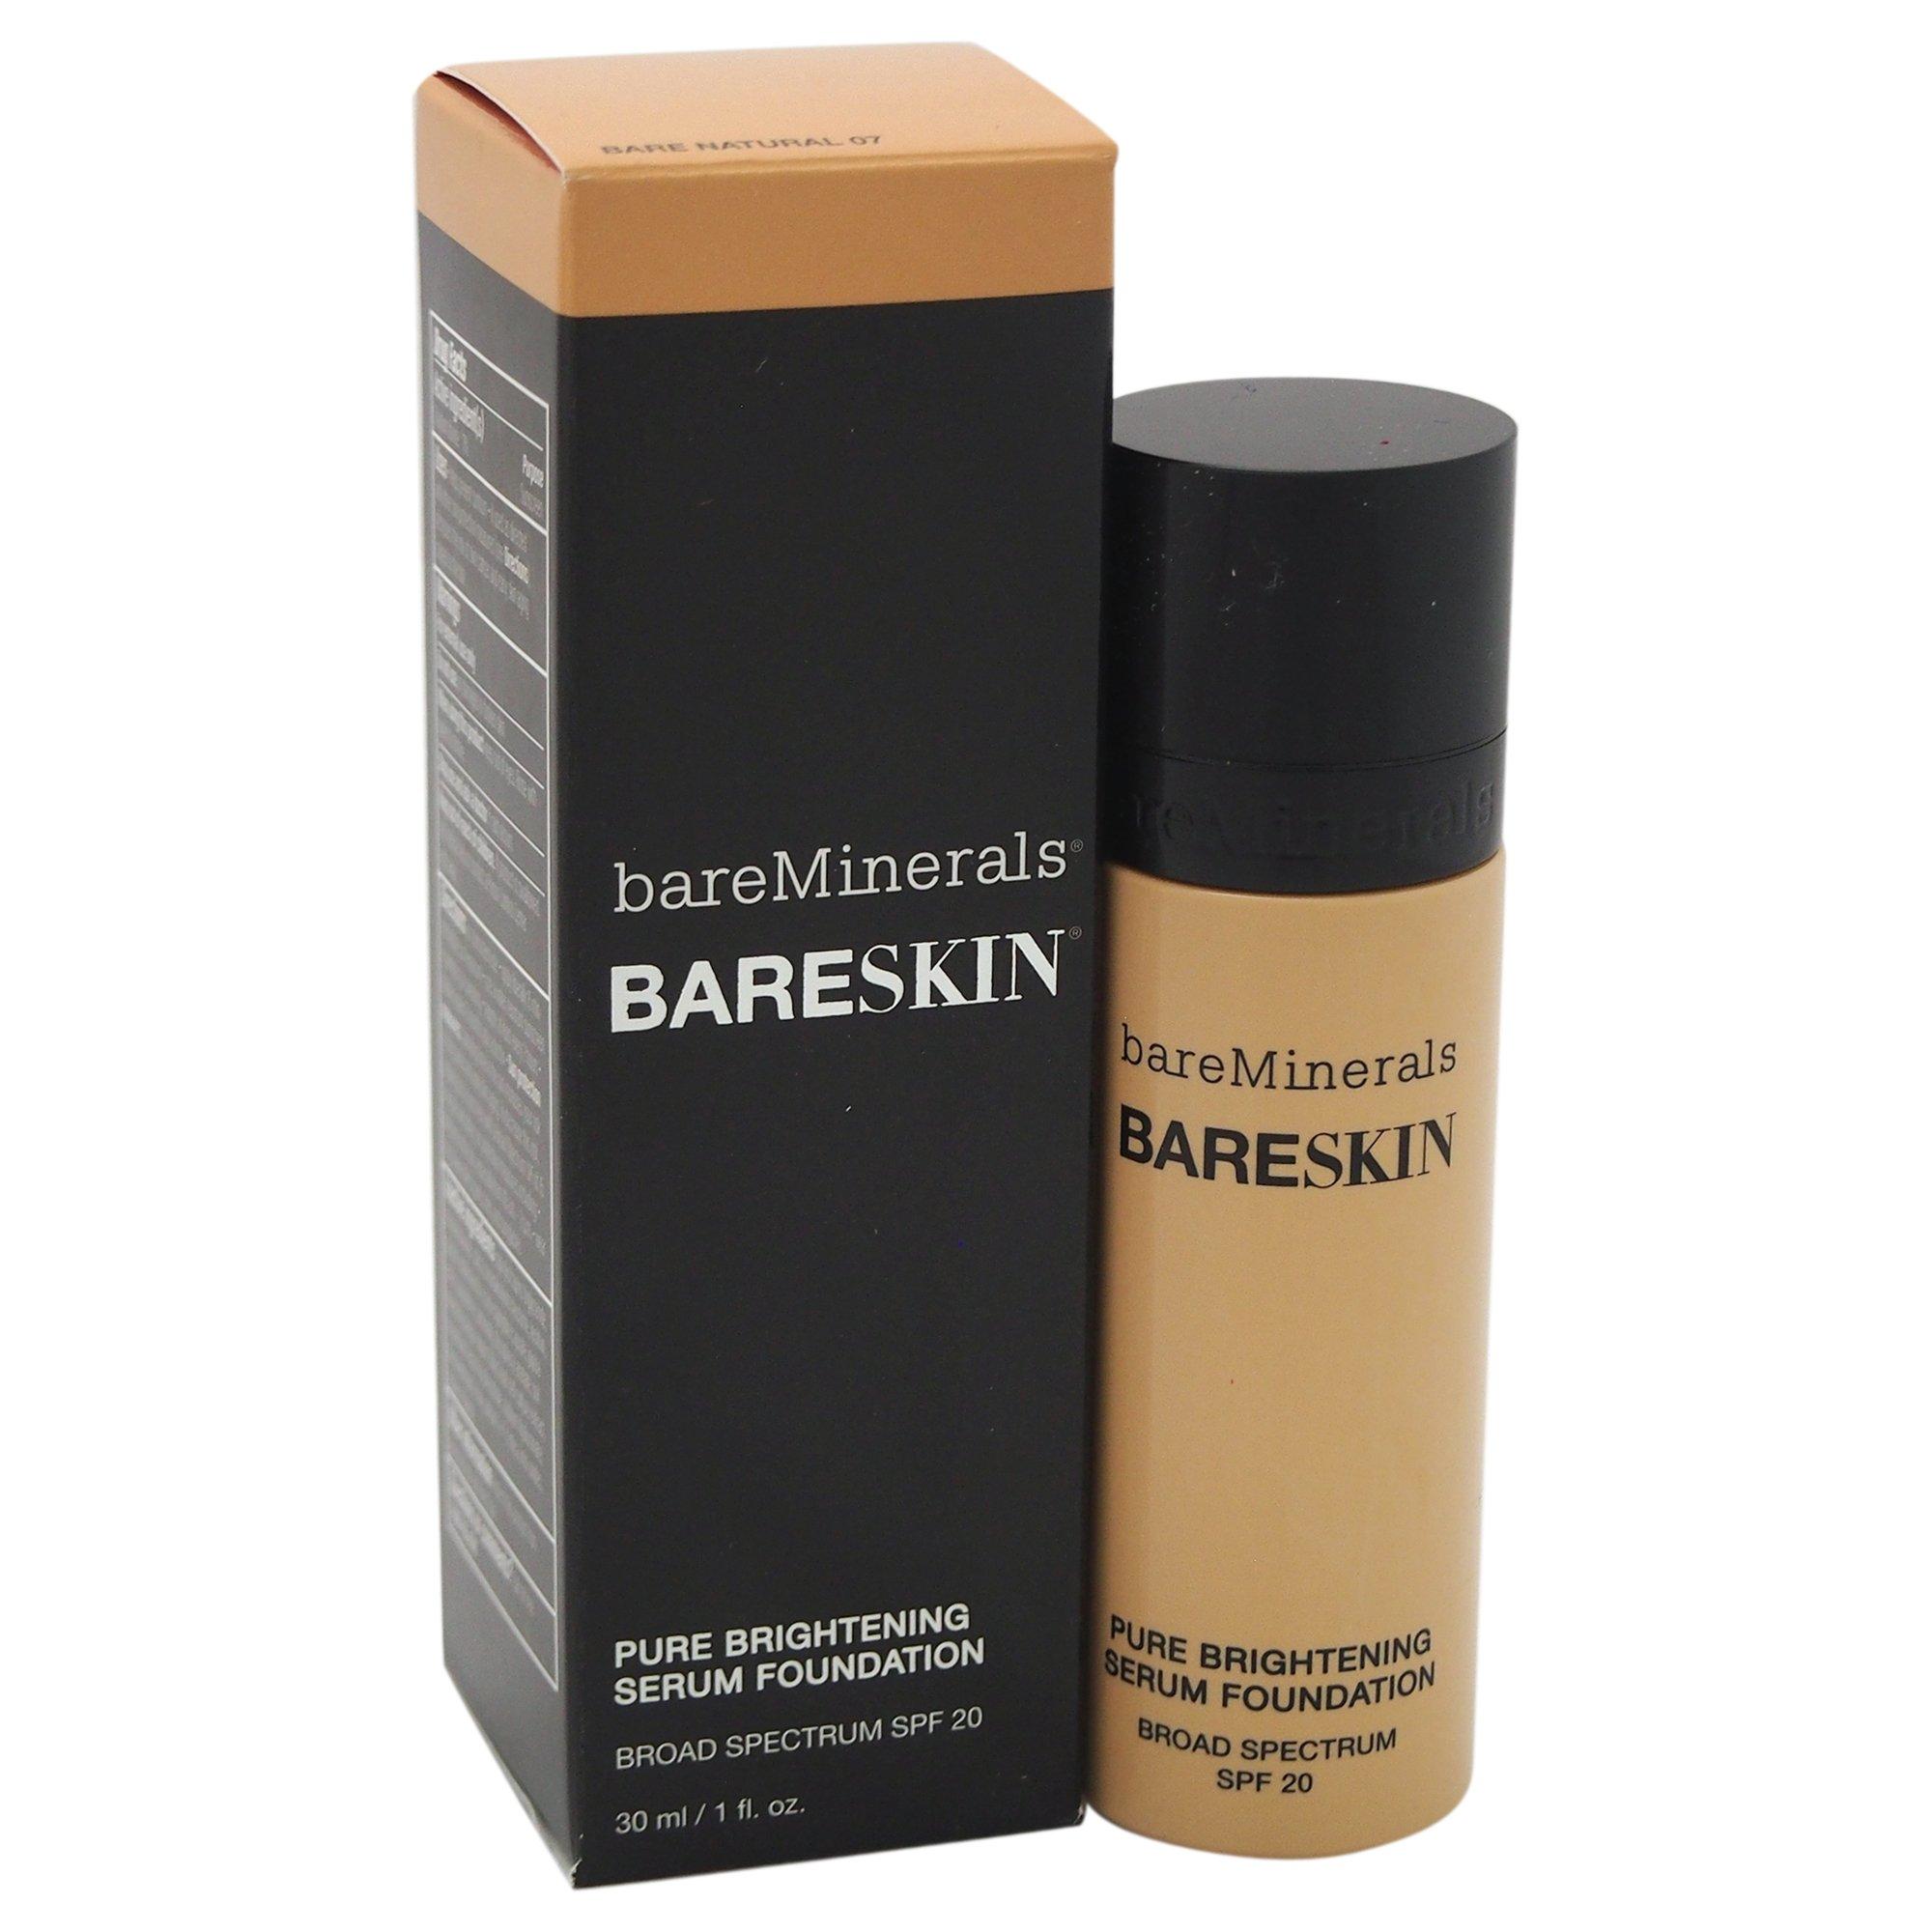 bareMinerals bareSkin Pure Brightening Serum Foundation SPF 20, Bare Natural 07, 1 Ounce